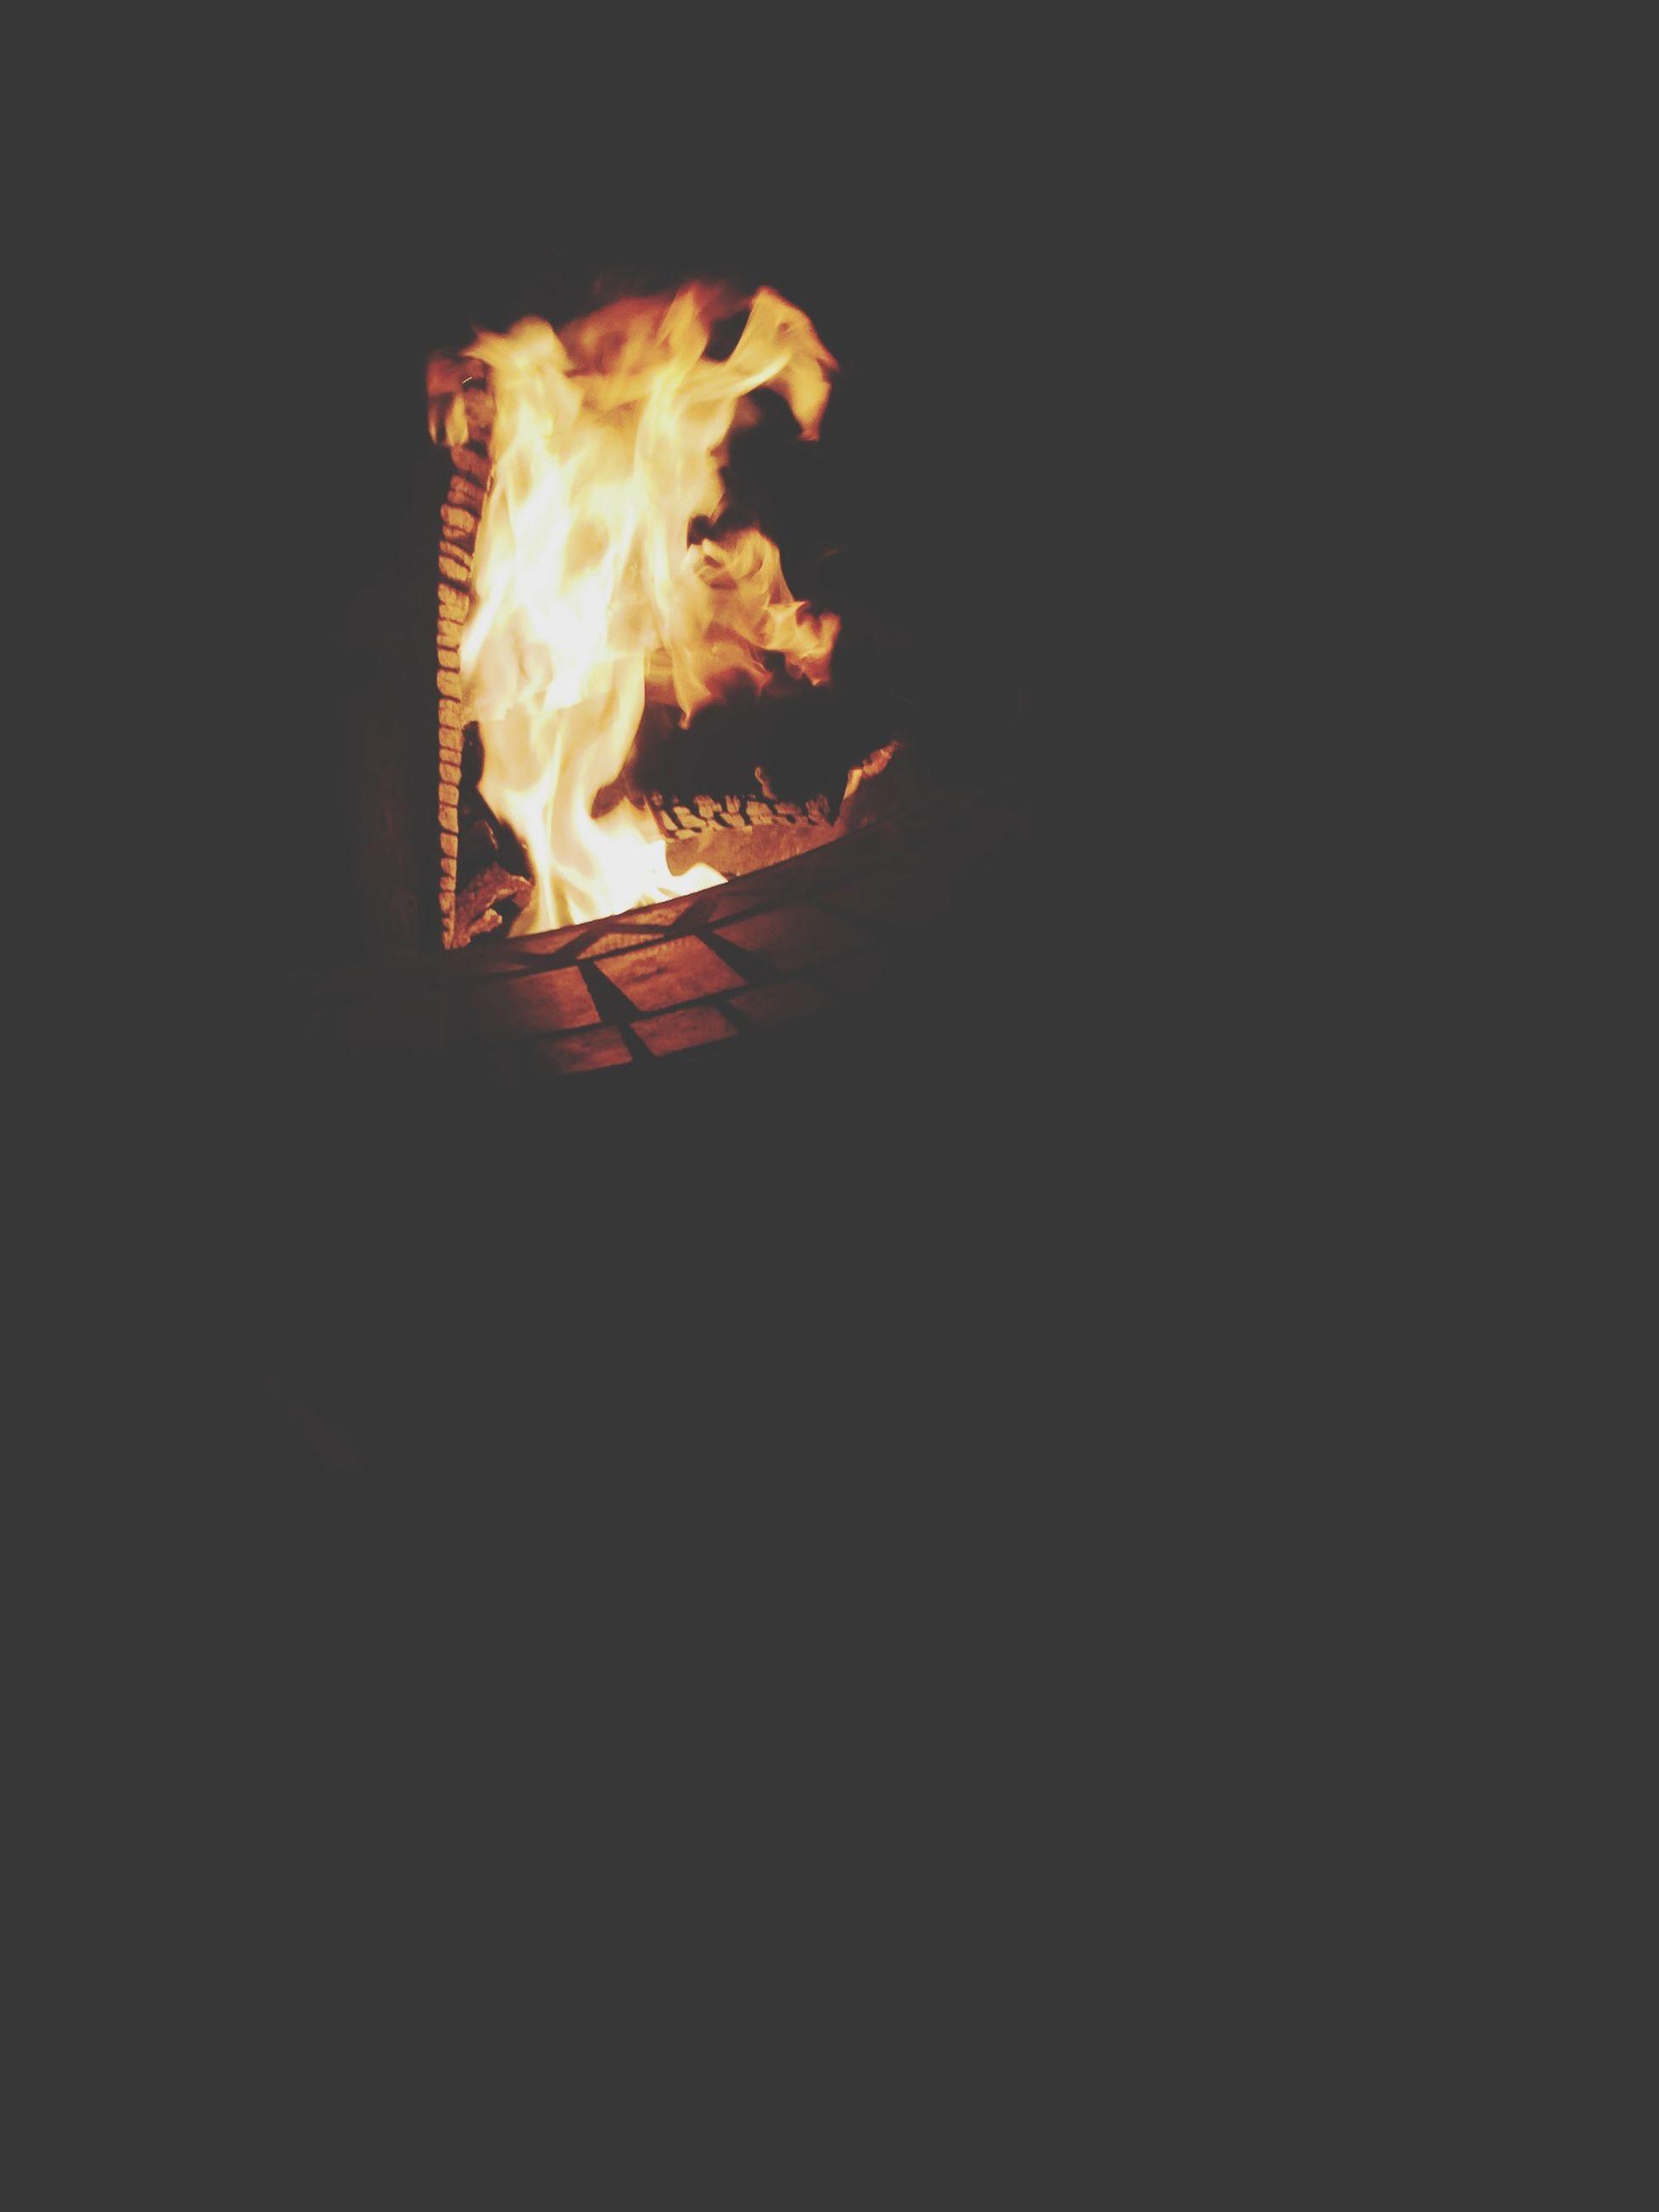 burning, flame, heat - temperature, fire - natural phenomenon, night, glowing, dark, orange color, fire, copy space, black background, bonfire, illuminated, studio shot, close-up, light - natural phenomenon, heat, wood - material, no people, firewood